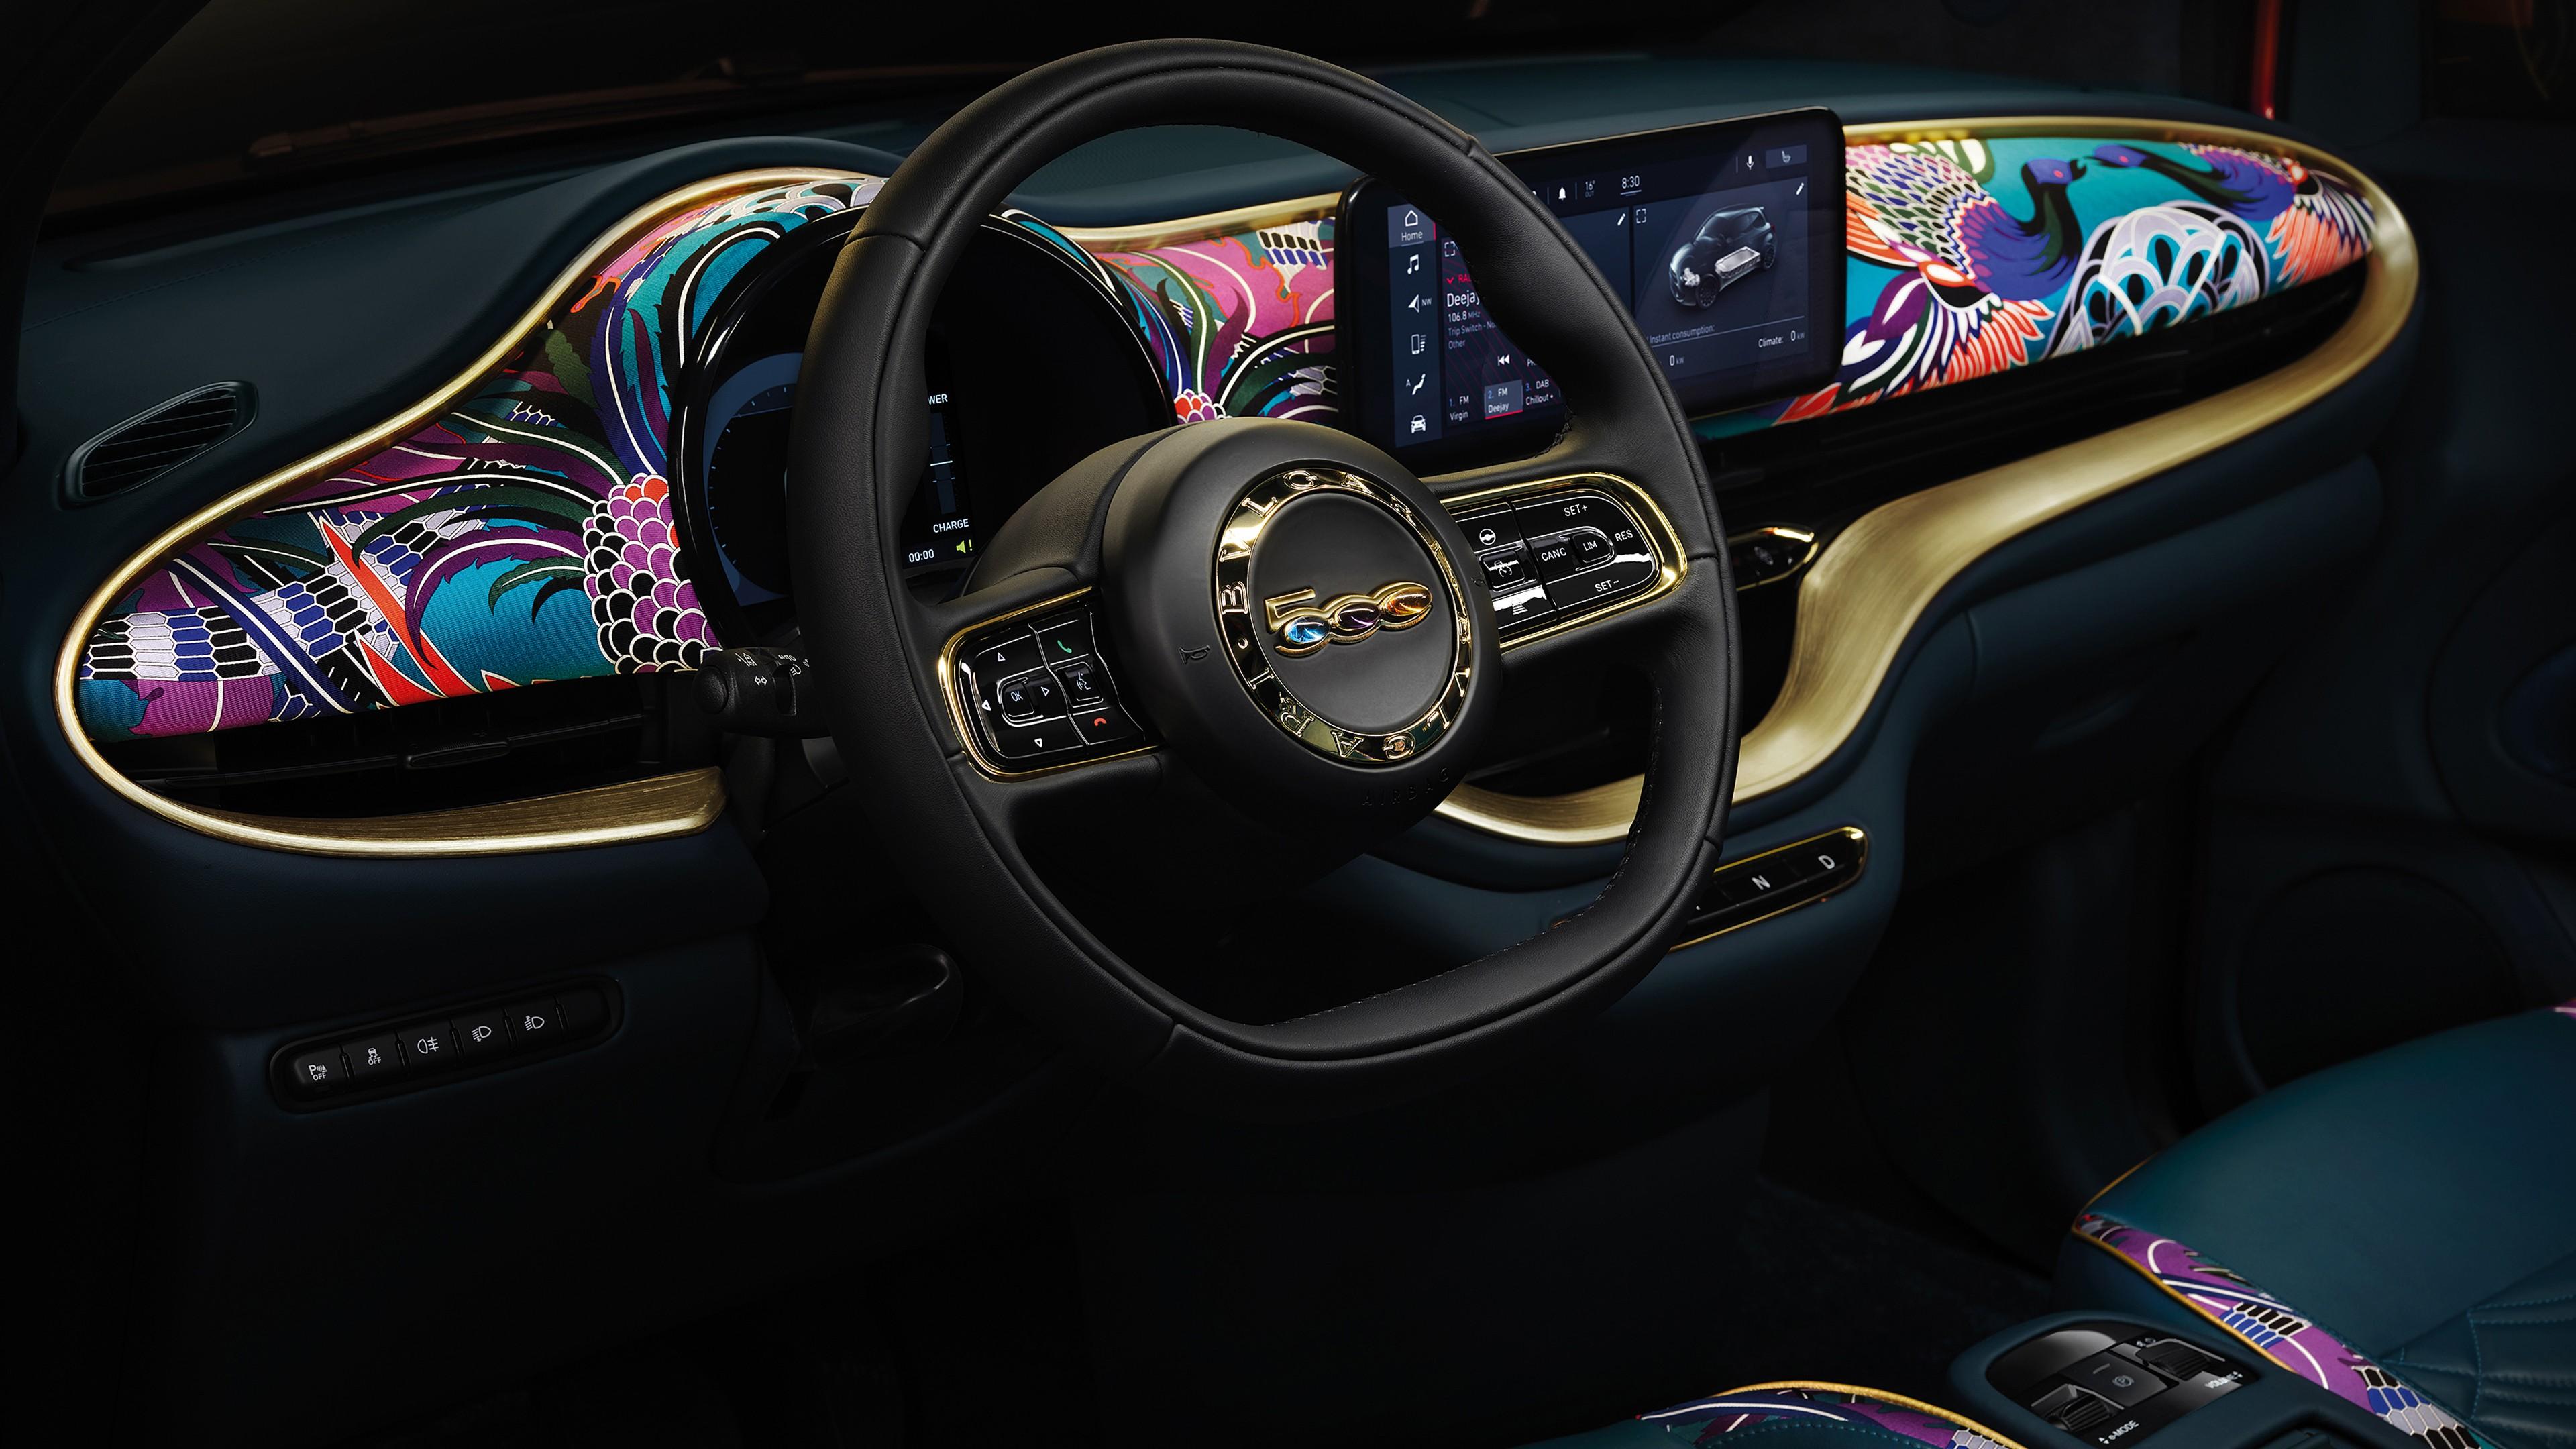 Fiat B500 Mai Troppo By Bvlgari 2020 Interior 4k Wallpaper Hd Car Wallpapers Id 14506